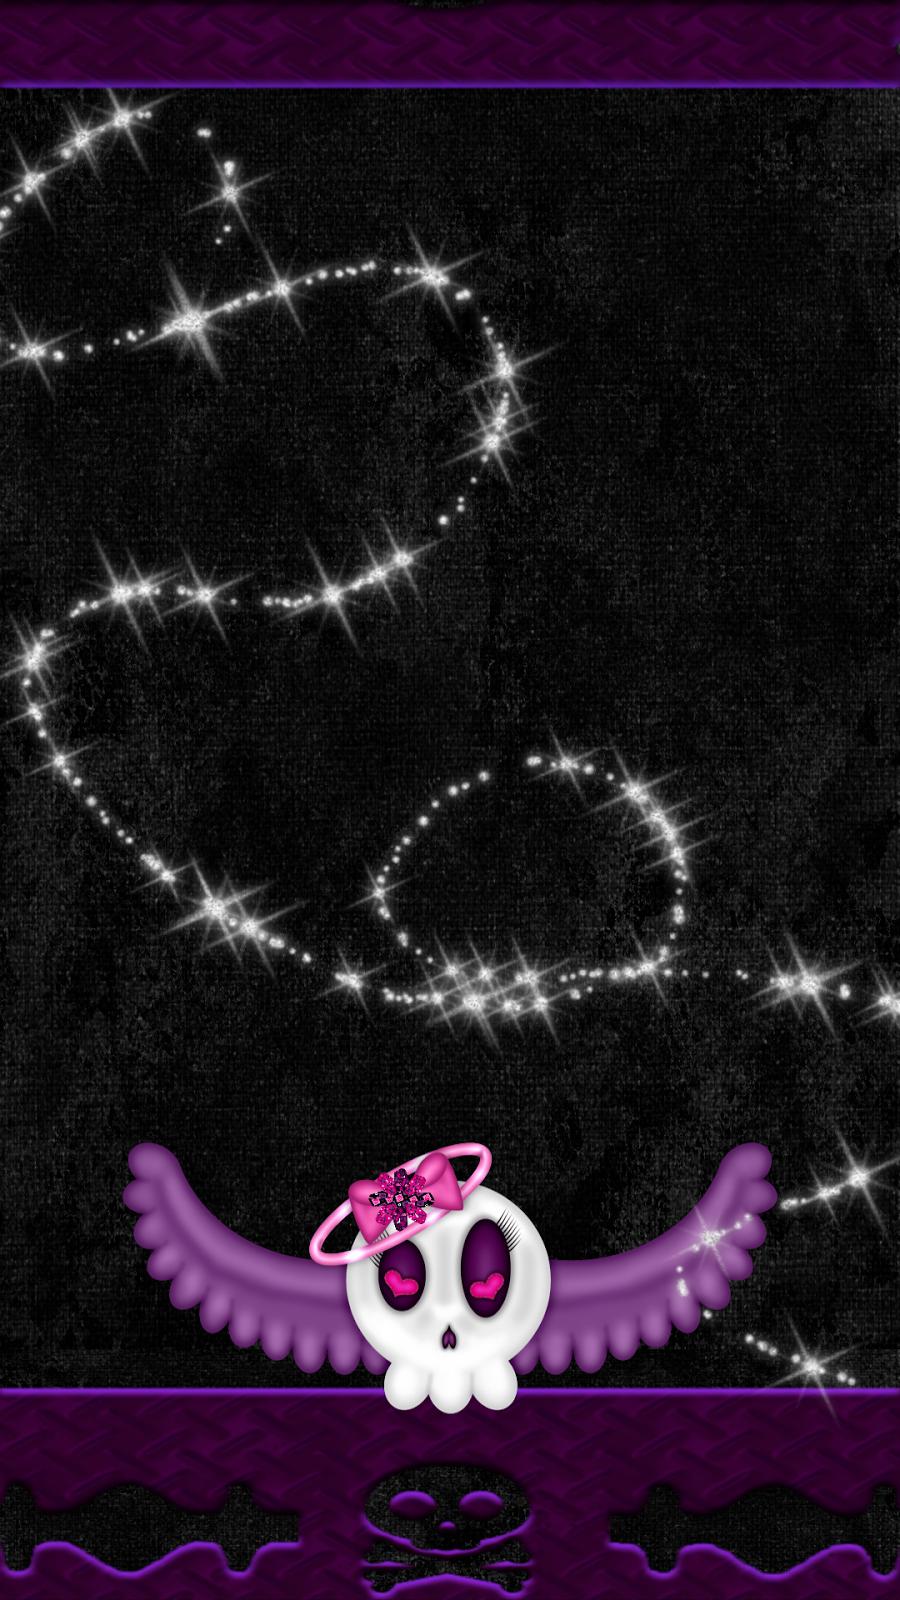 Blingin-Android-Hallo-Kitty-Walls-wallpaper-wp5204719